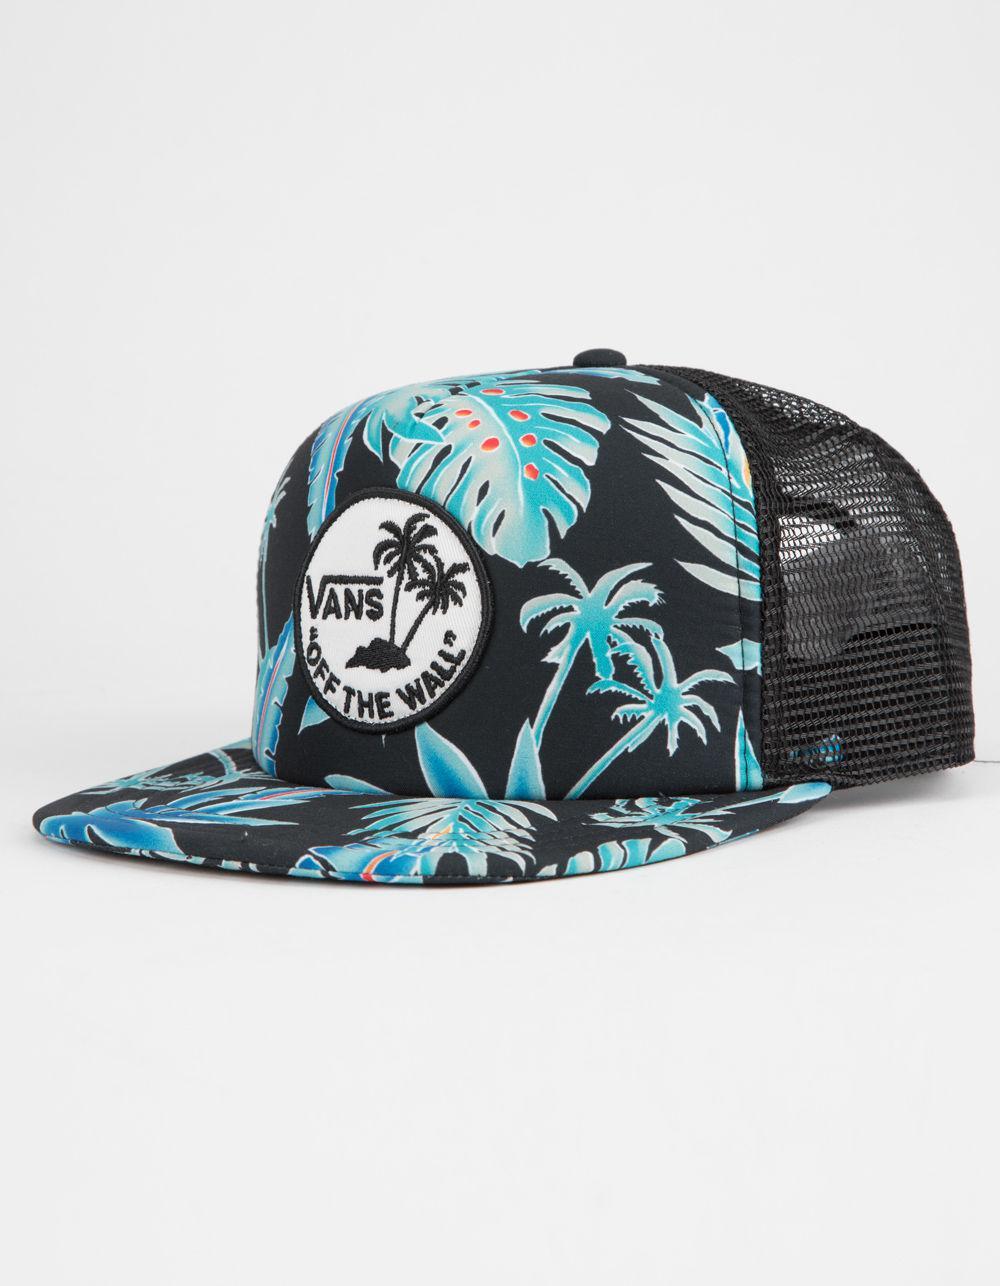 Lyst - Vans Surf Patch Mens Trucker Hat in Black for Men 698c36dda3ad